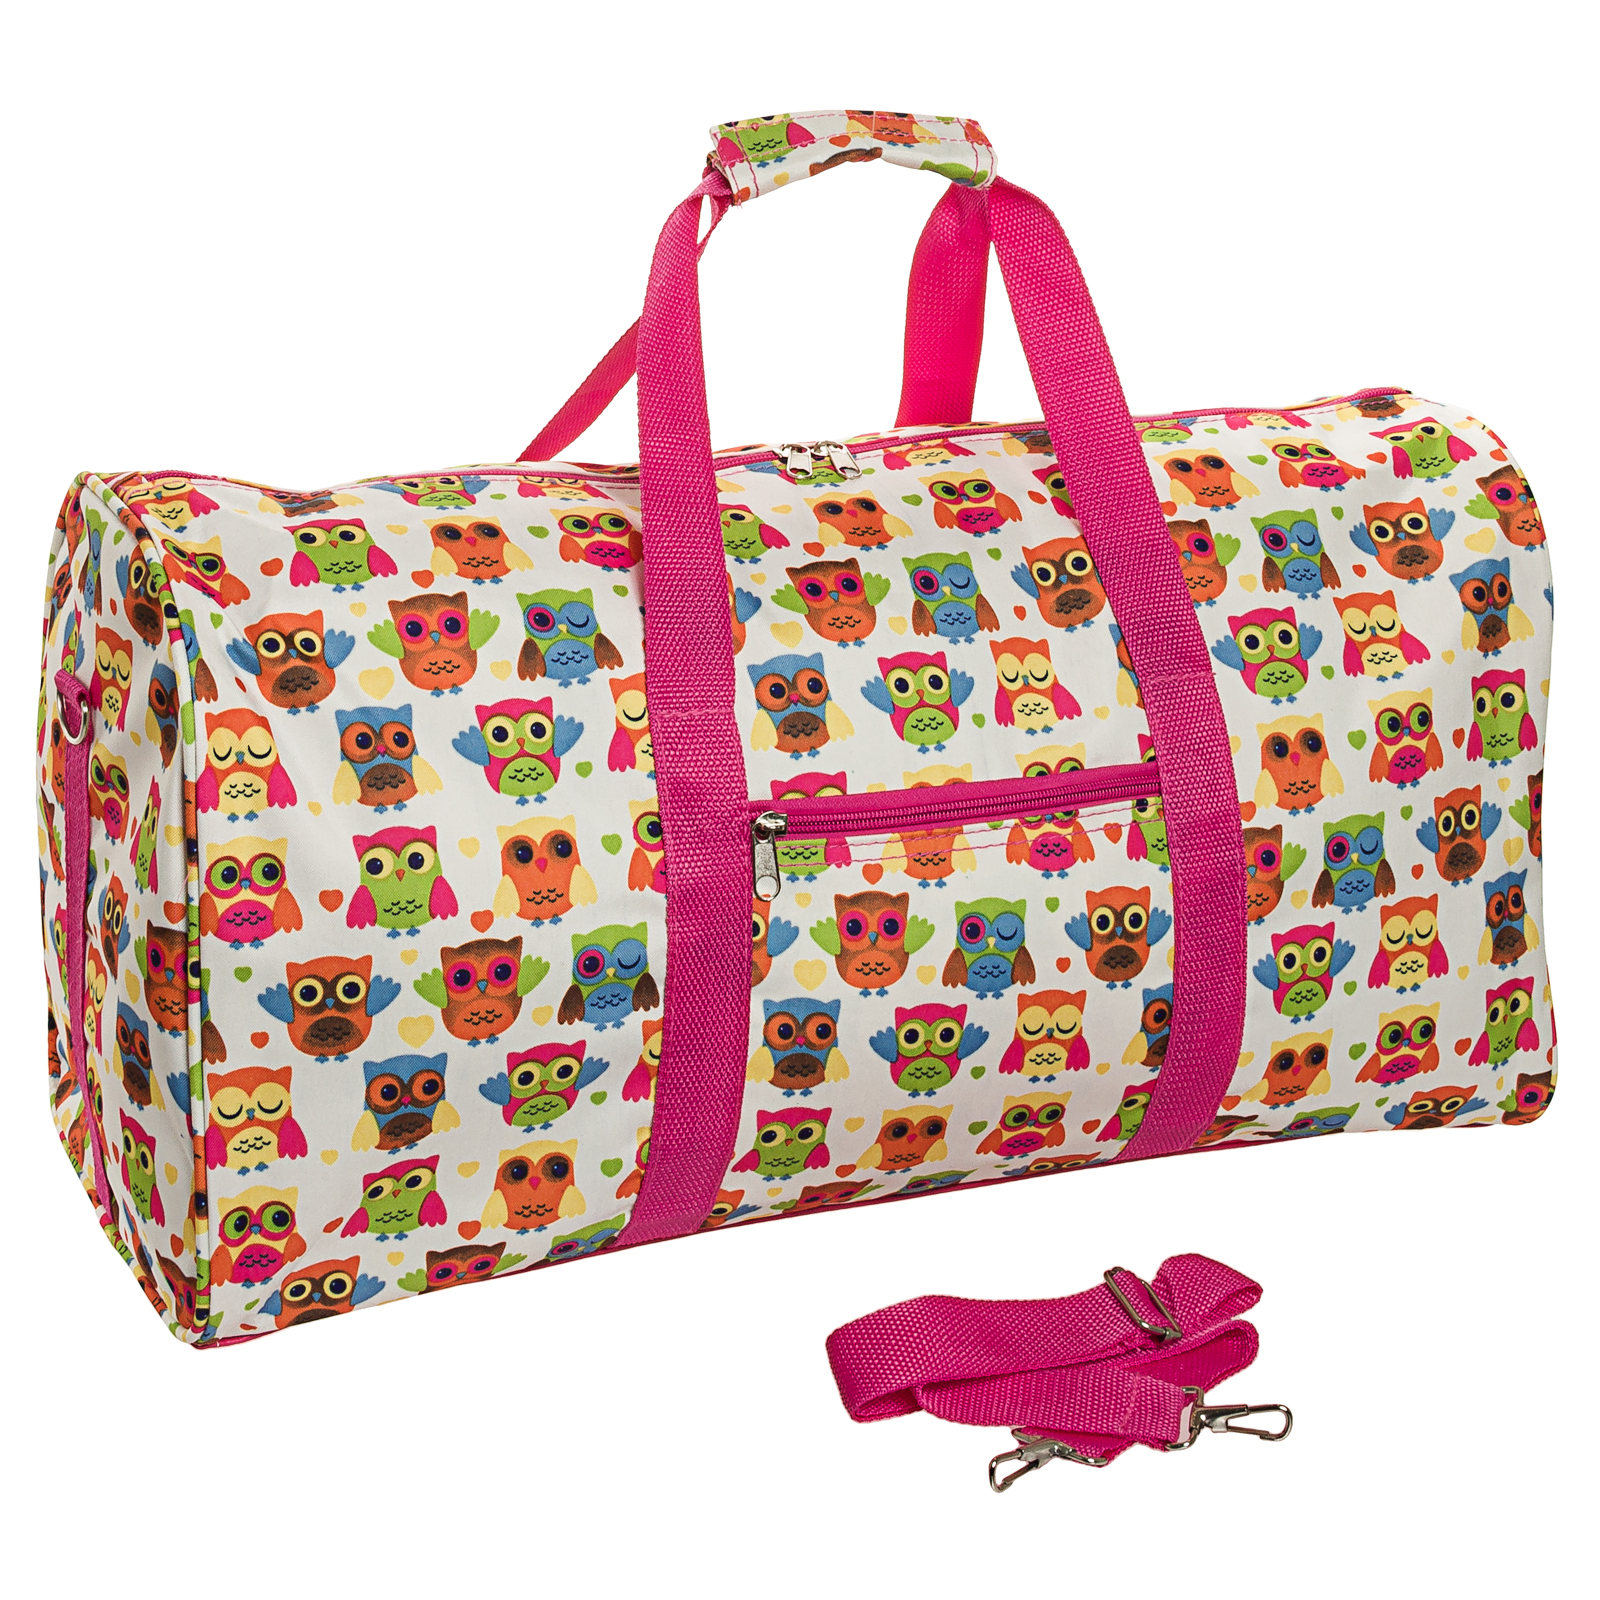 Lastest Jenni Chan Womenu0026#39;s Damask 20-inch Carry On Soft Gym Duffel Bag - Walmart.com